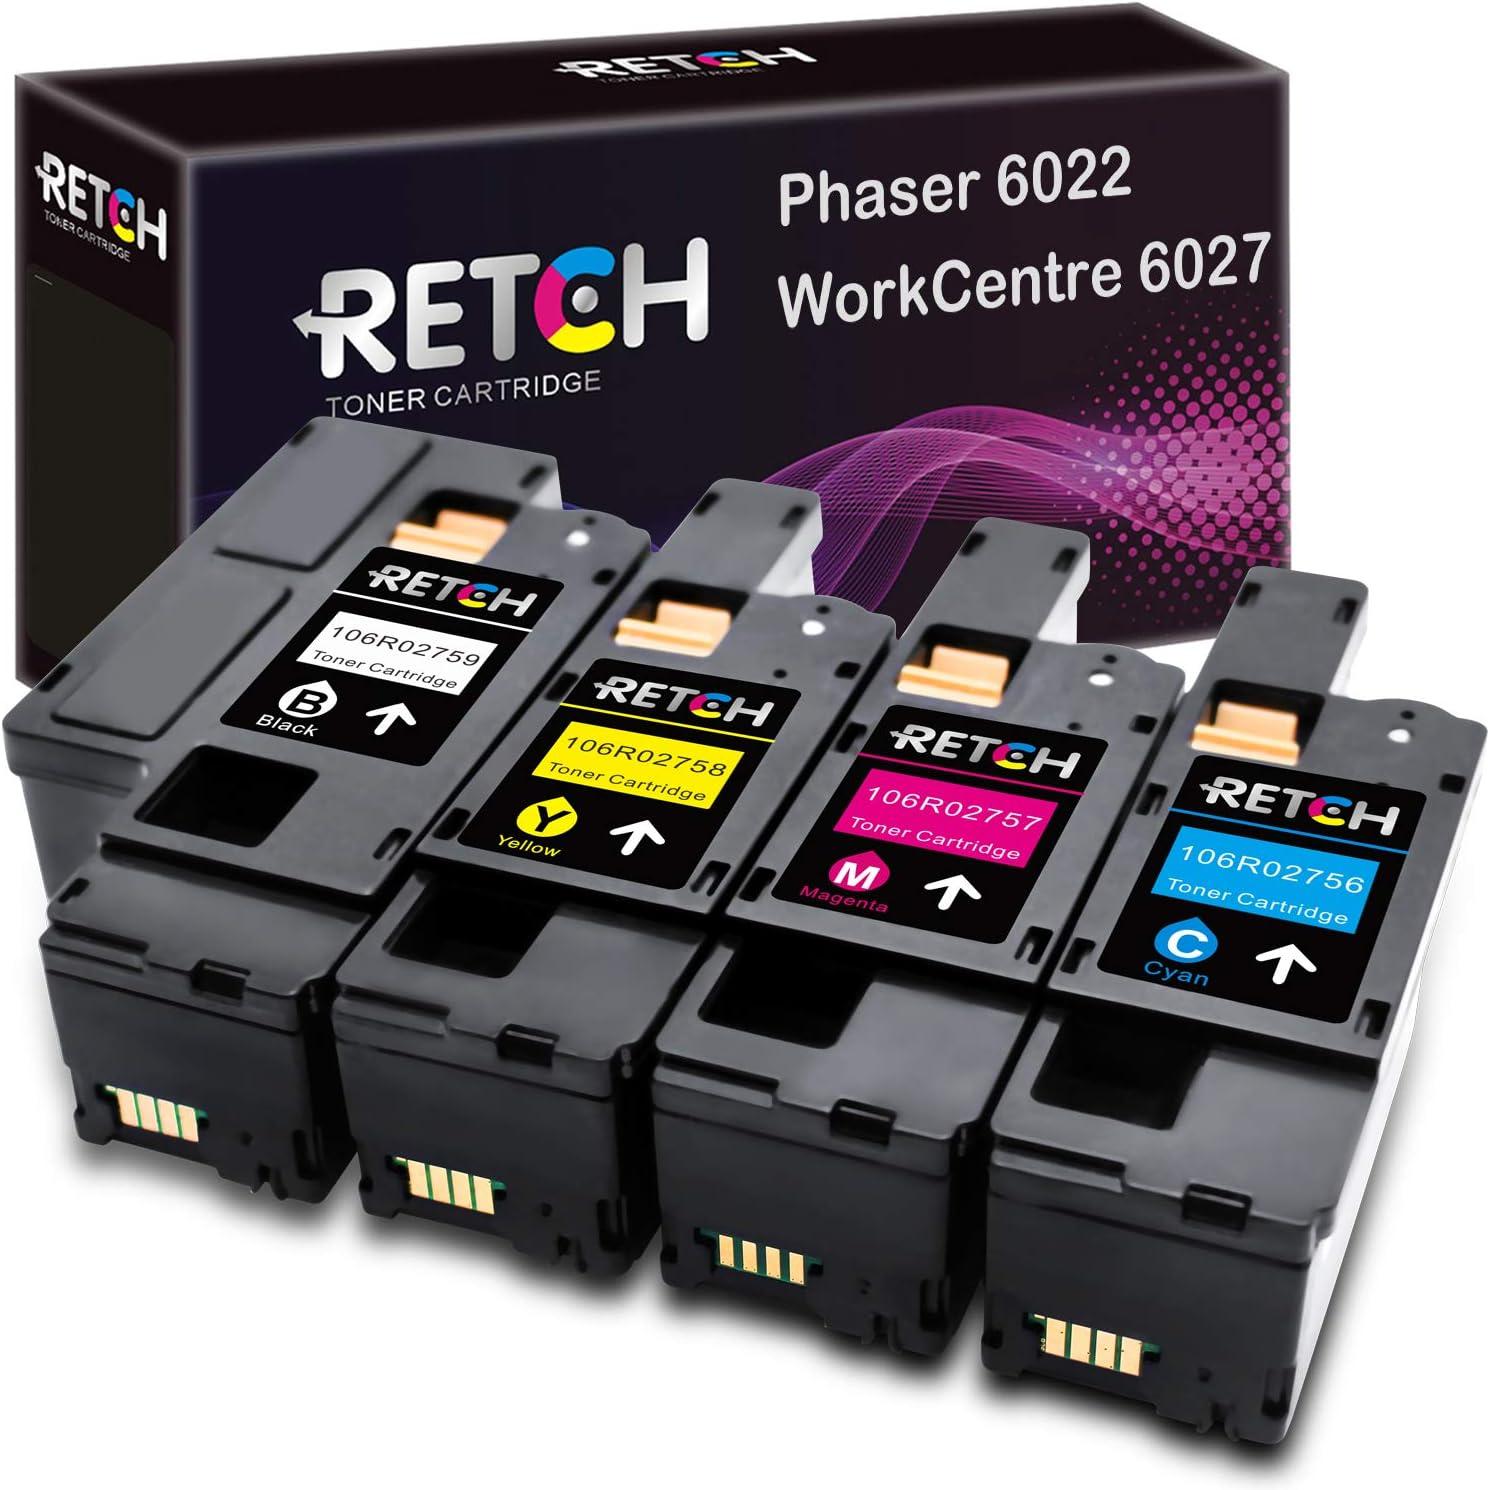 Toner Compatible Xerox Workcentre 6027 6025 Xerox Phaser6022